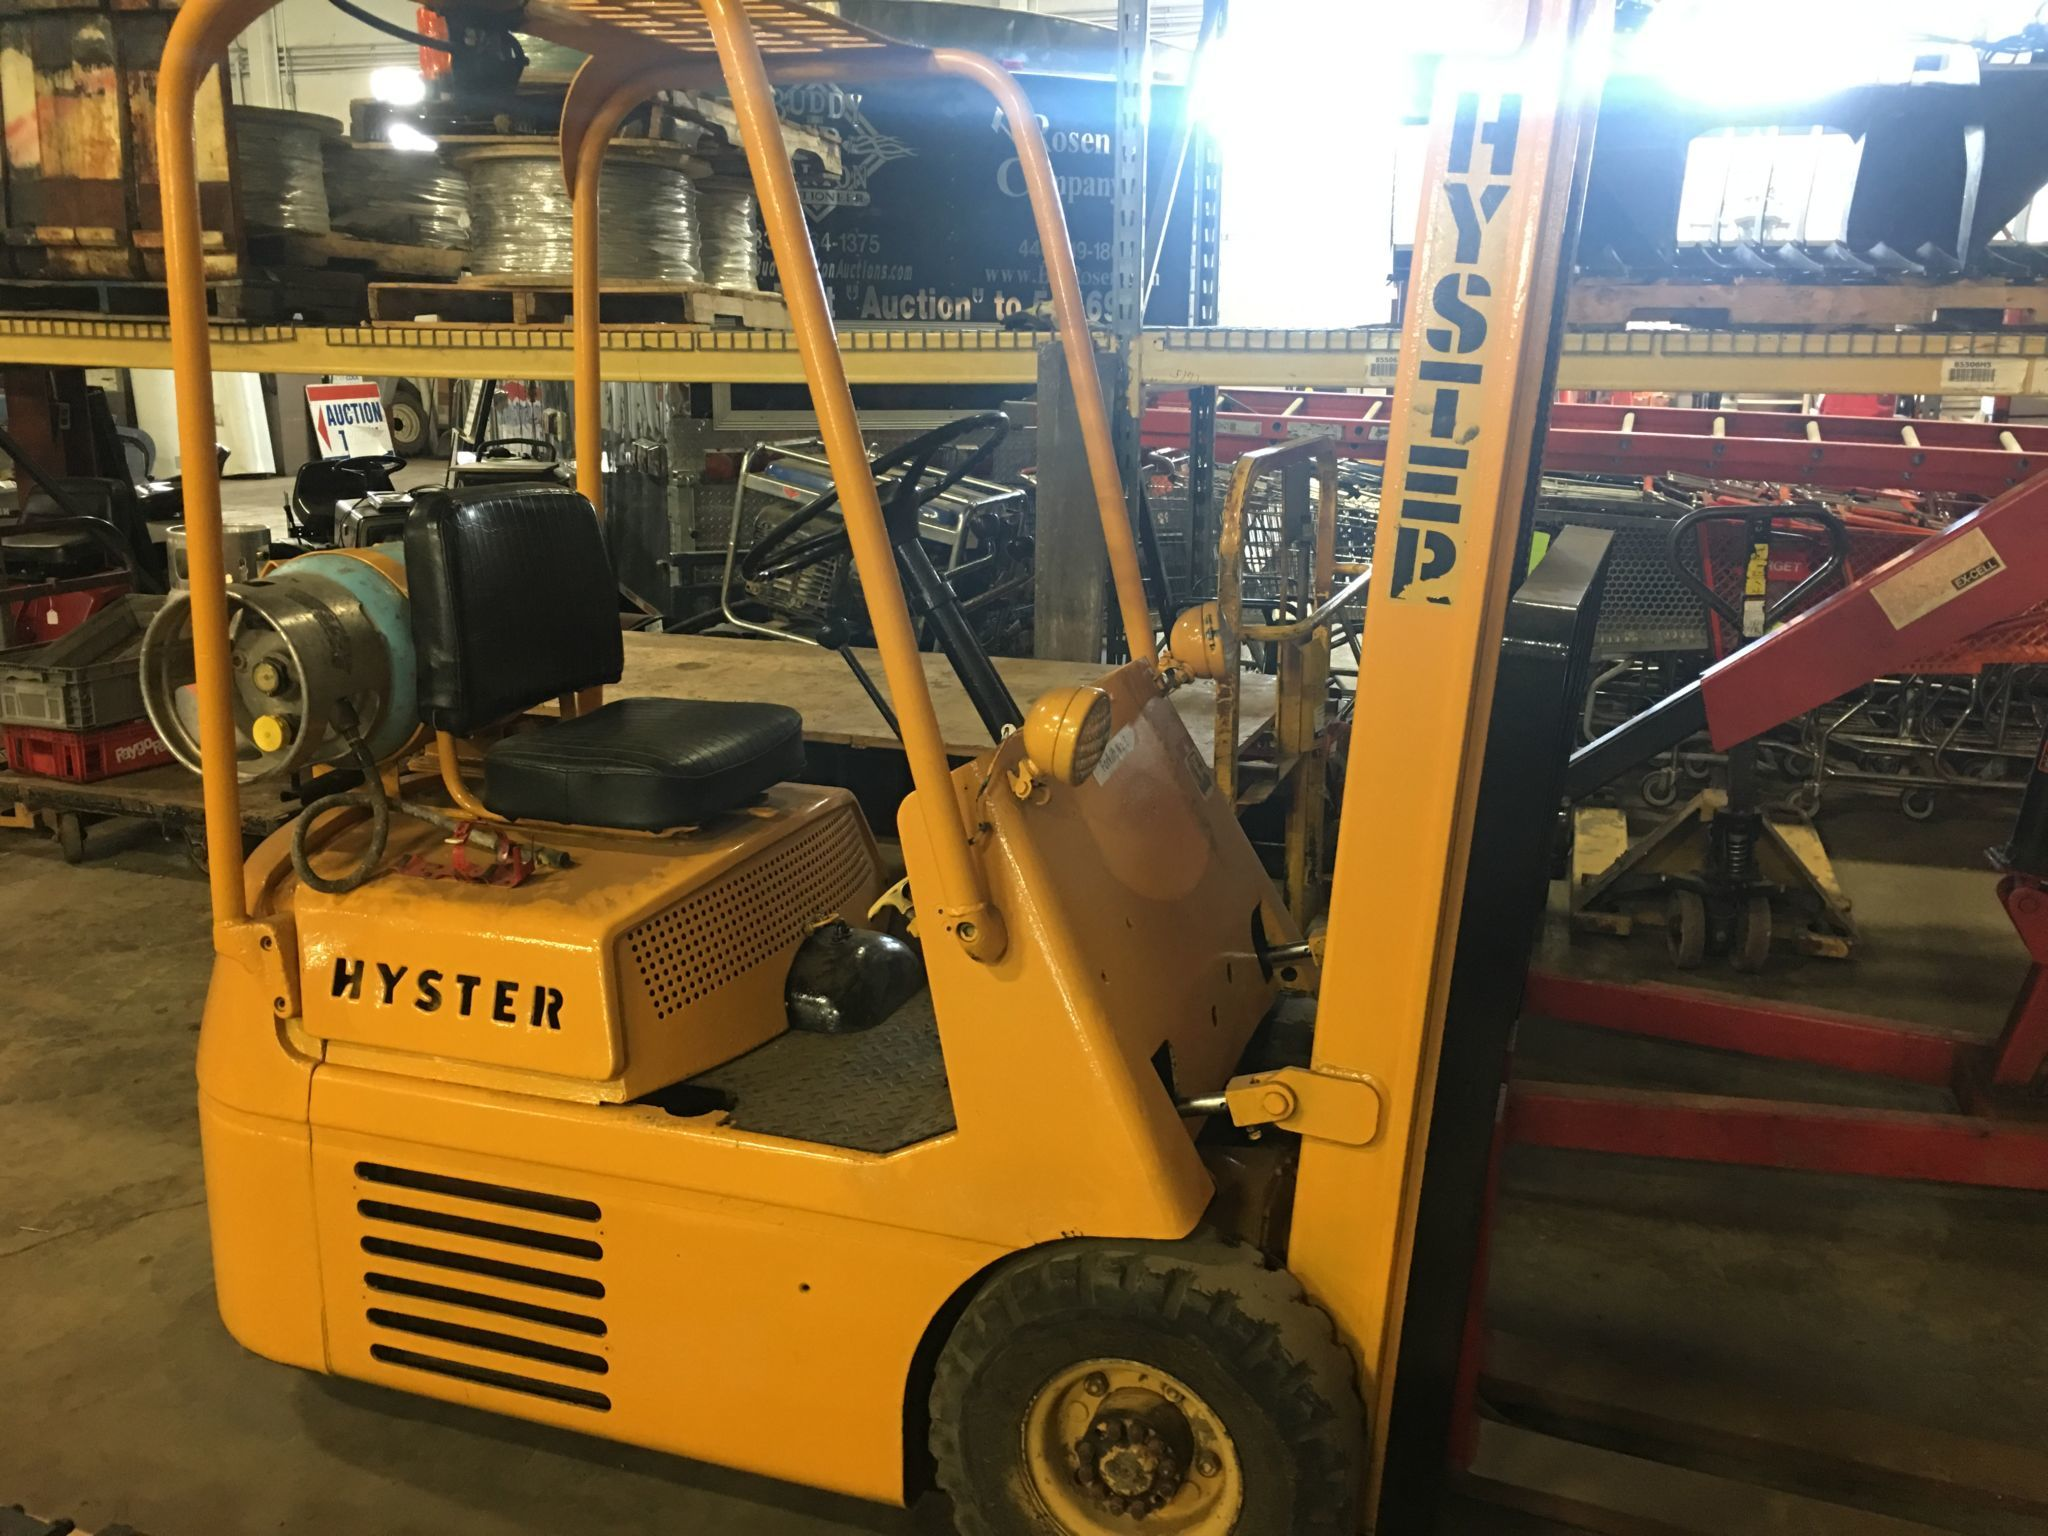 Hyster 3 Wheel Forklift